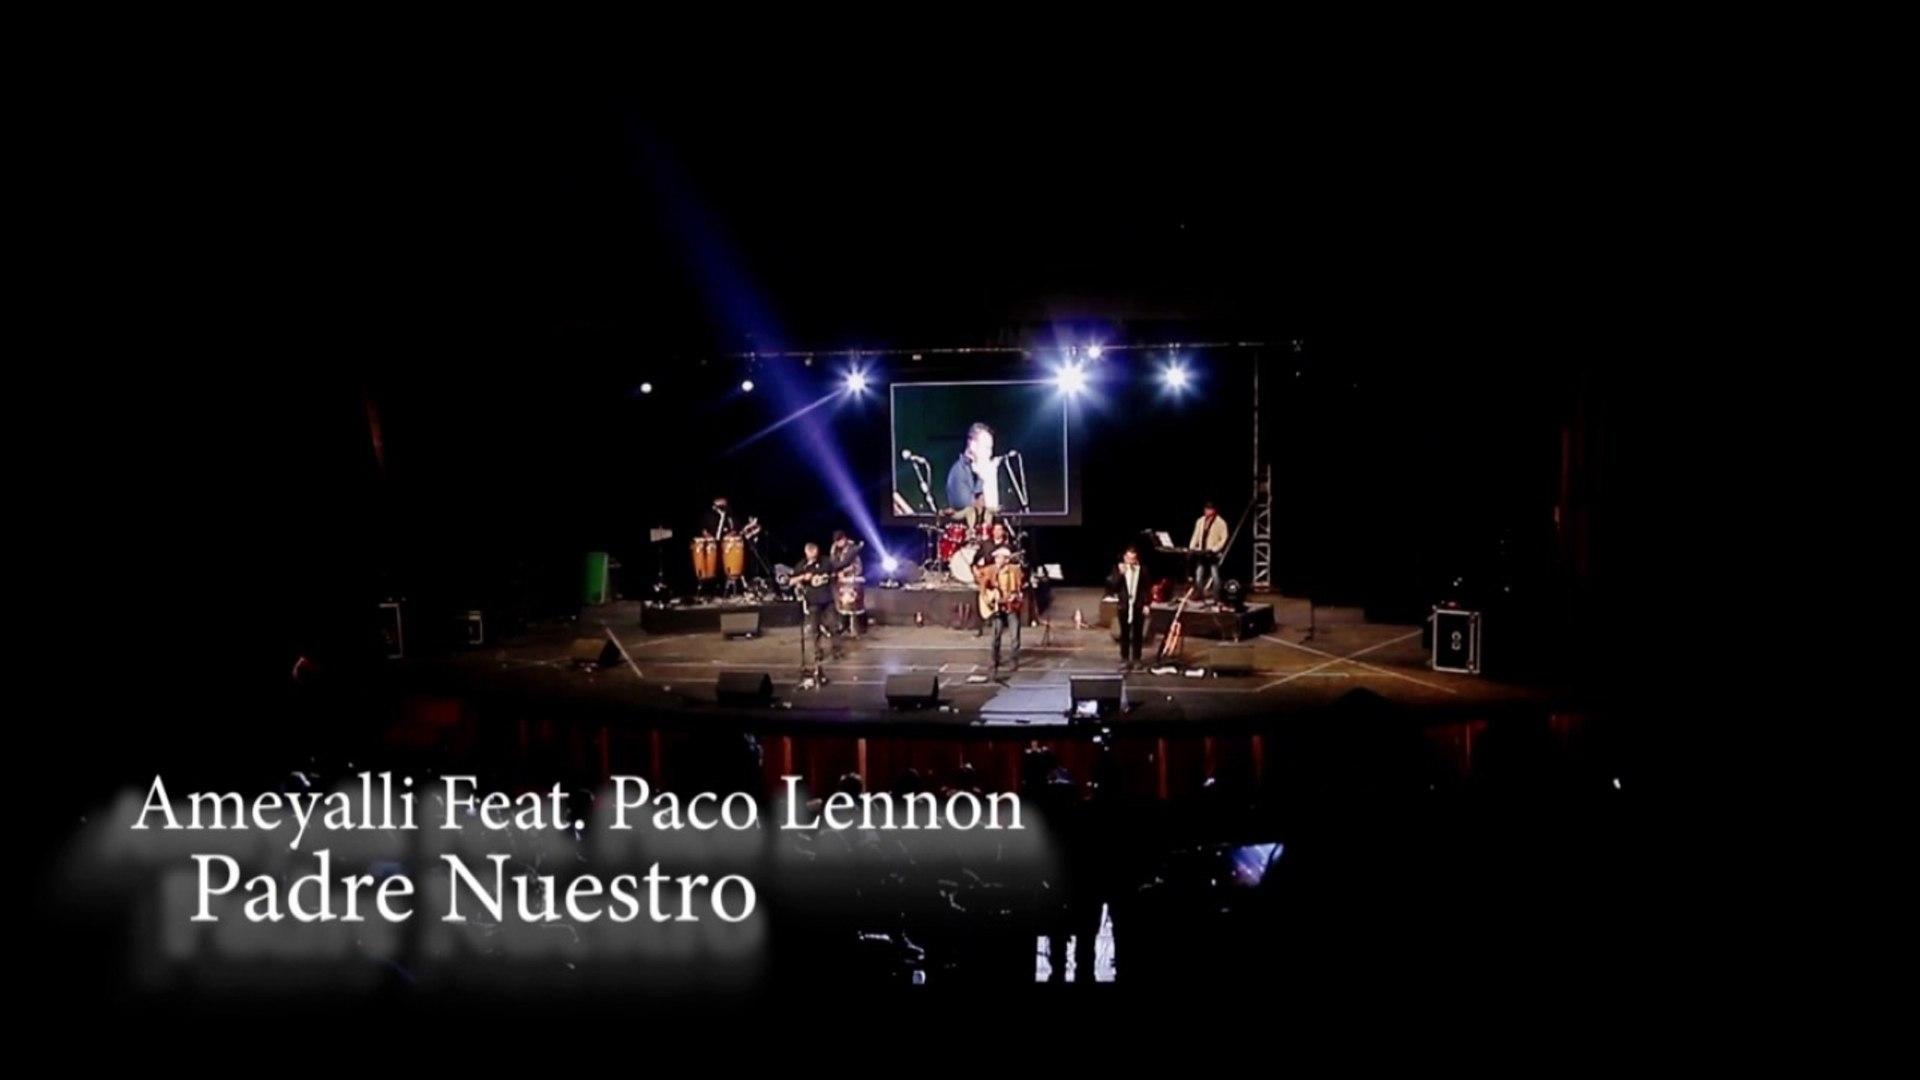 AMEYALLI Ft. PACO LENNON Y SU ONNOR BAND - PADRE NUESTRO -